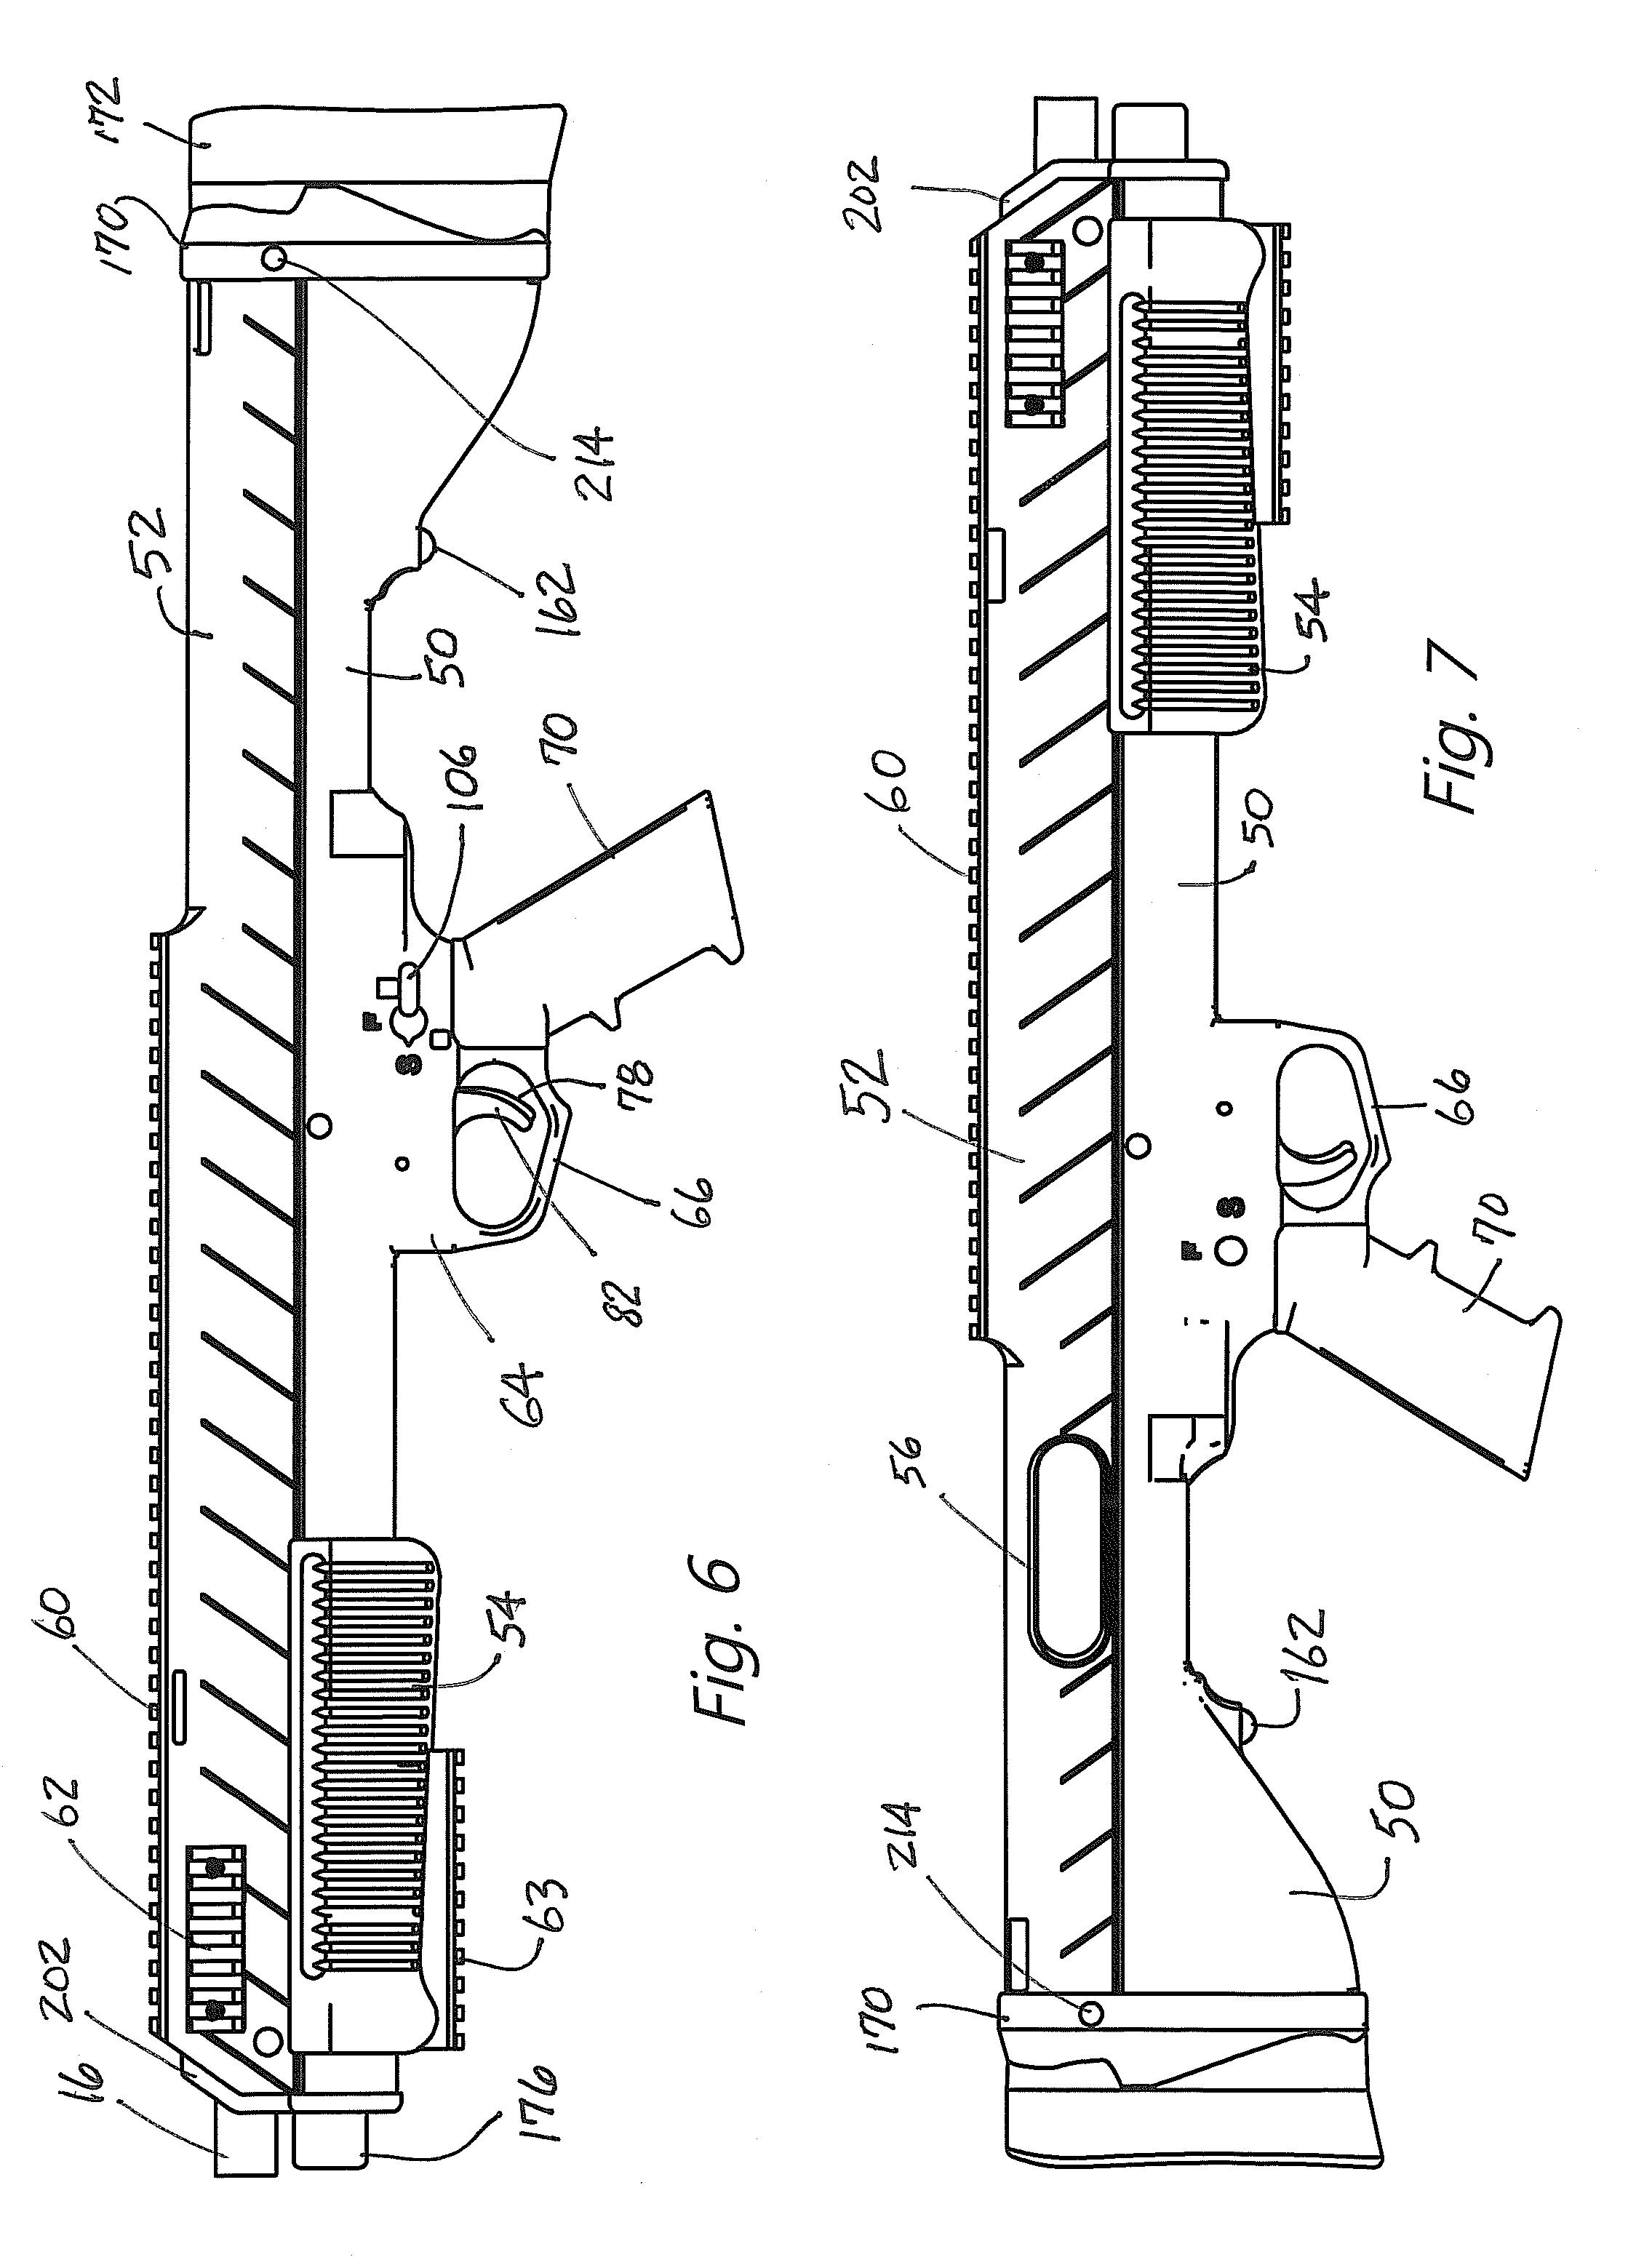 patent us8615915 bullpup conversion kit for firearm google patents